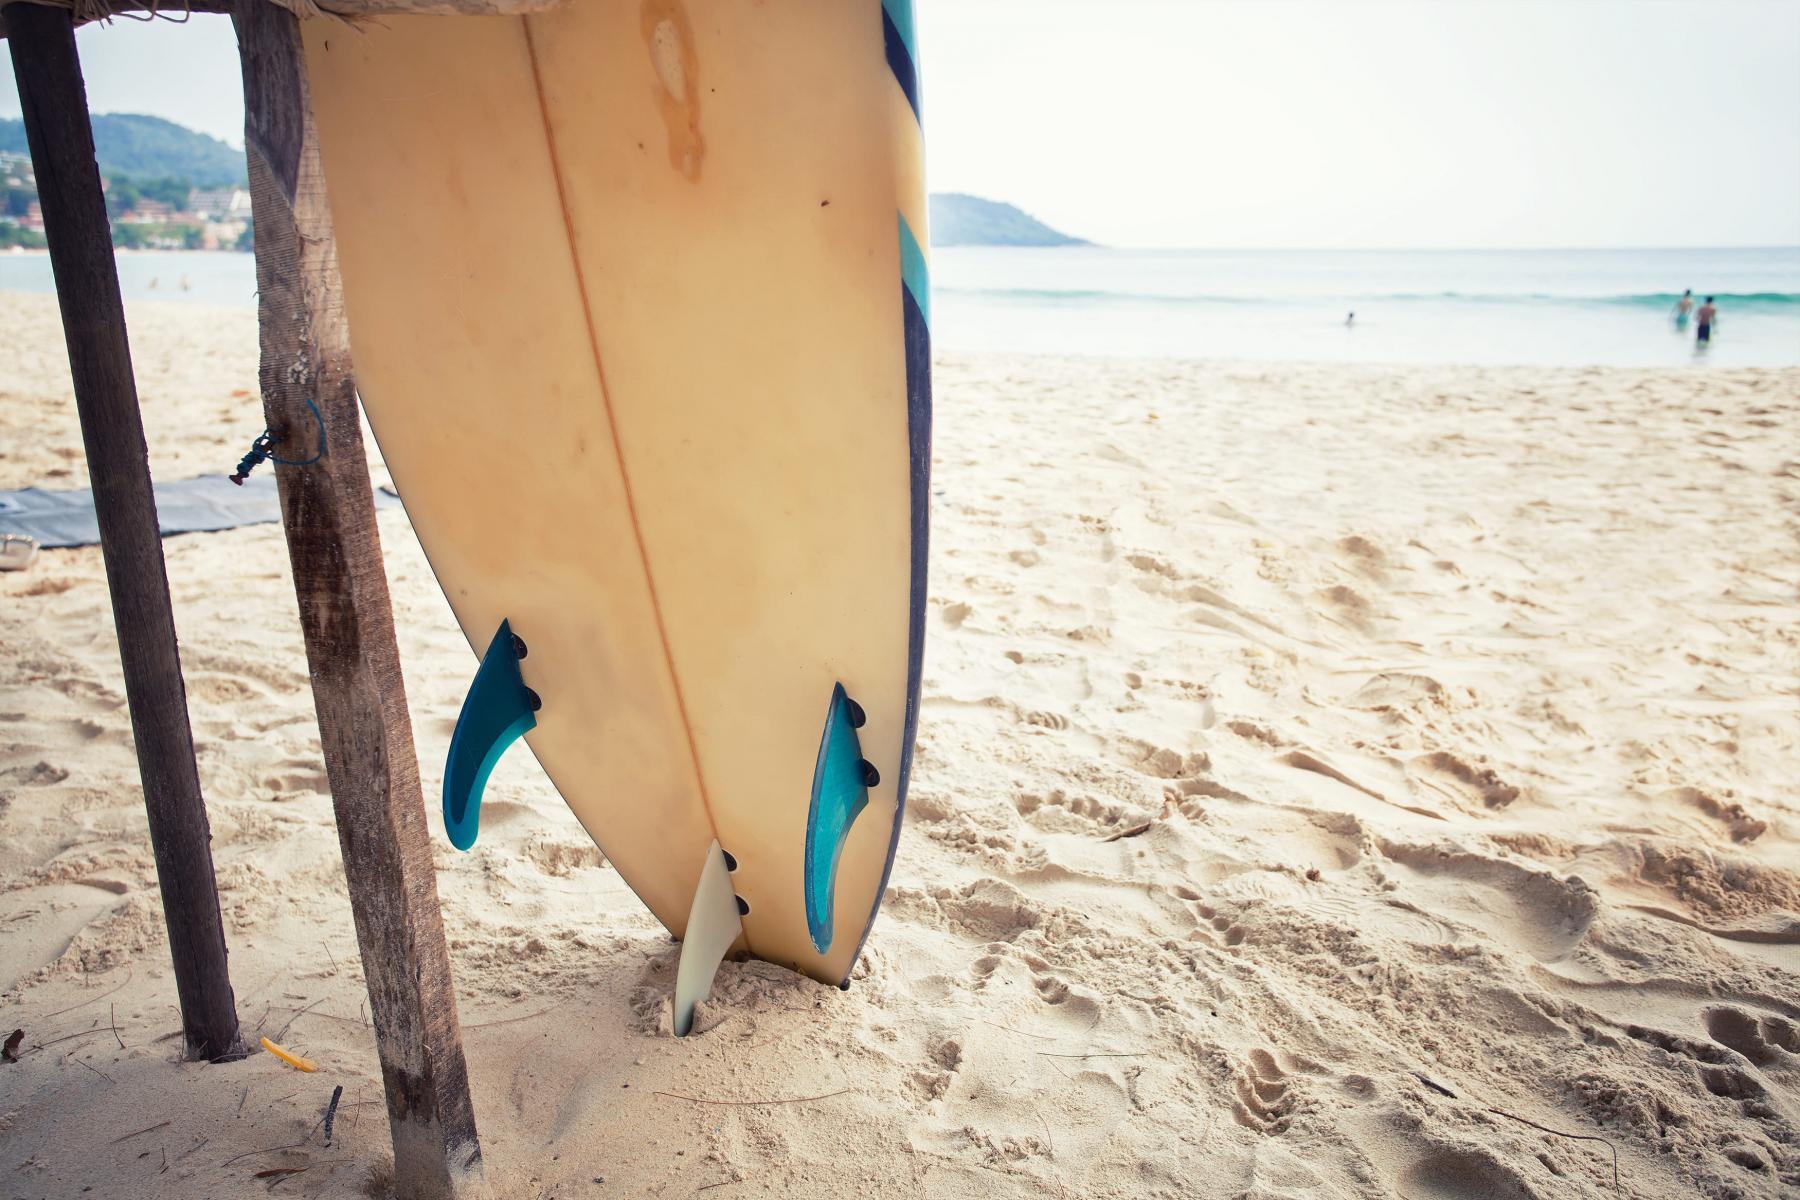 A surfboard at the beach